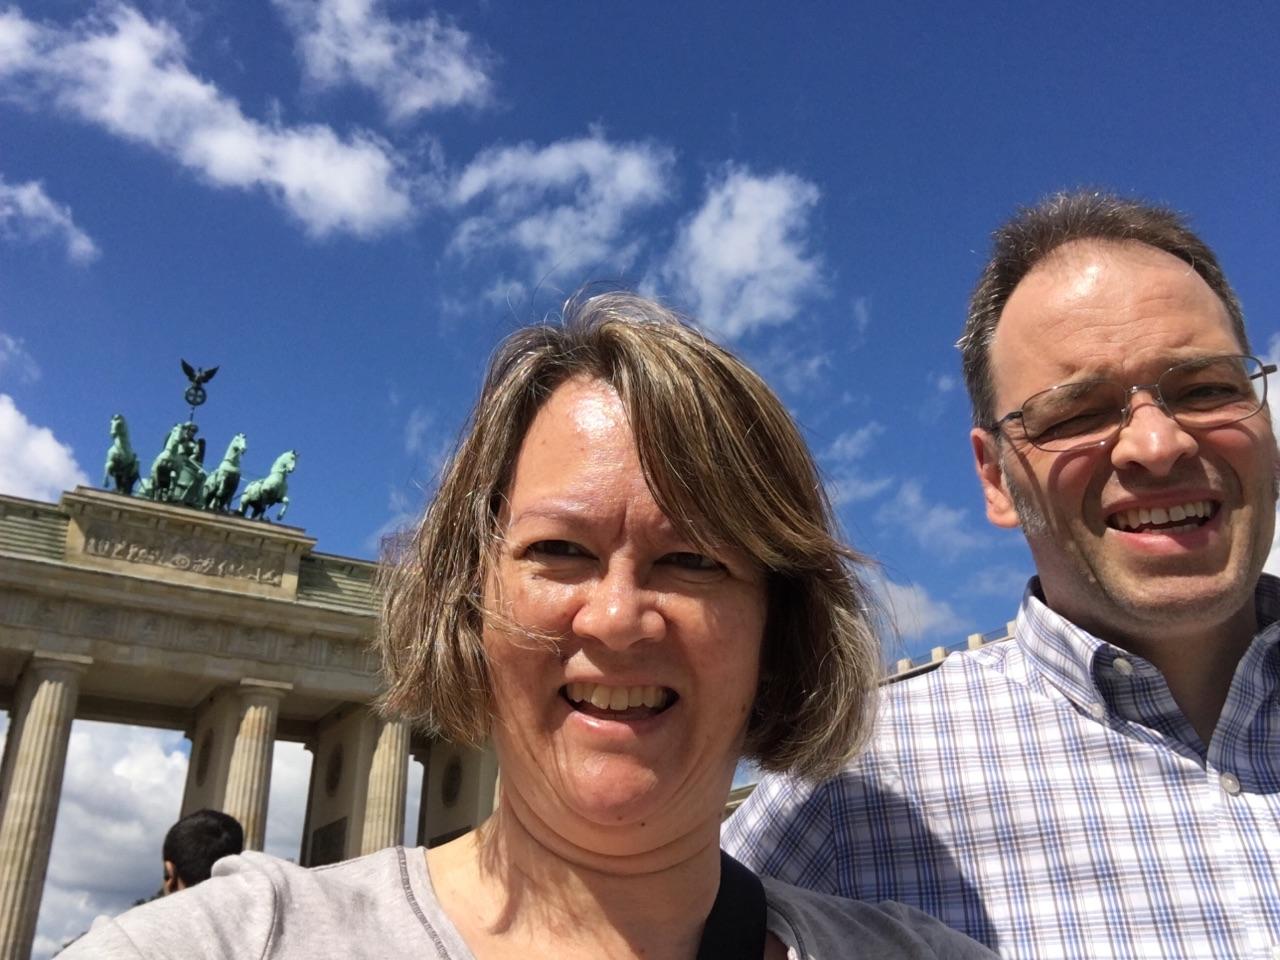 At Brandenburg Gate